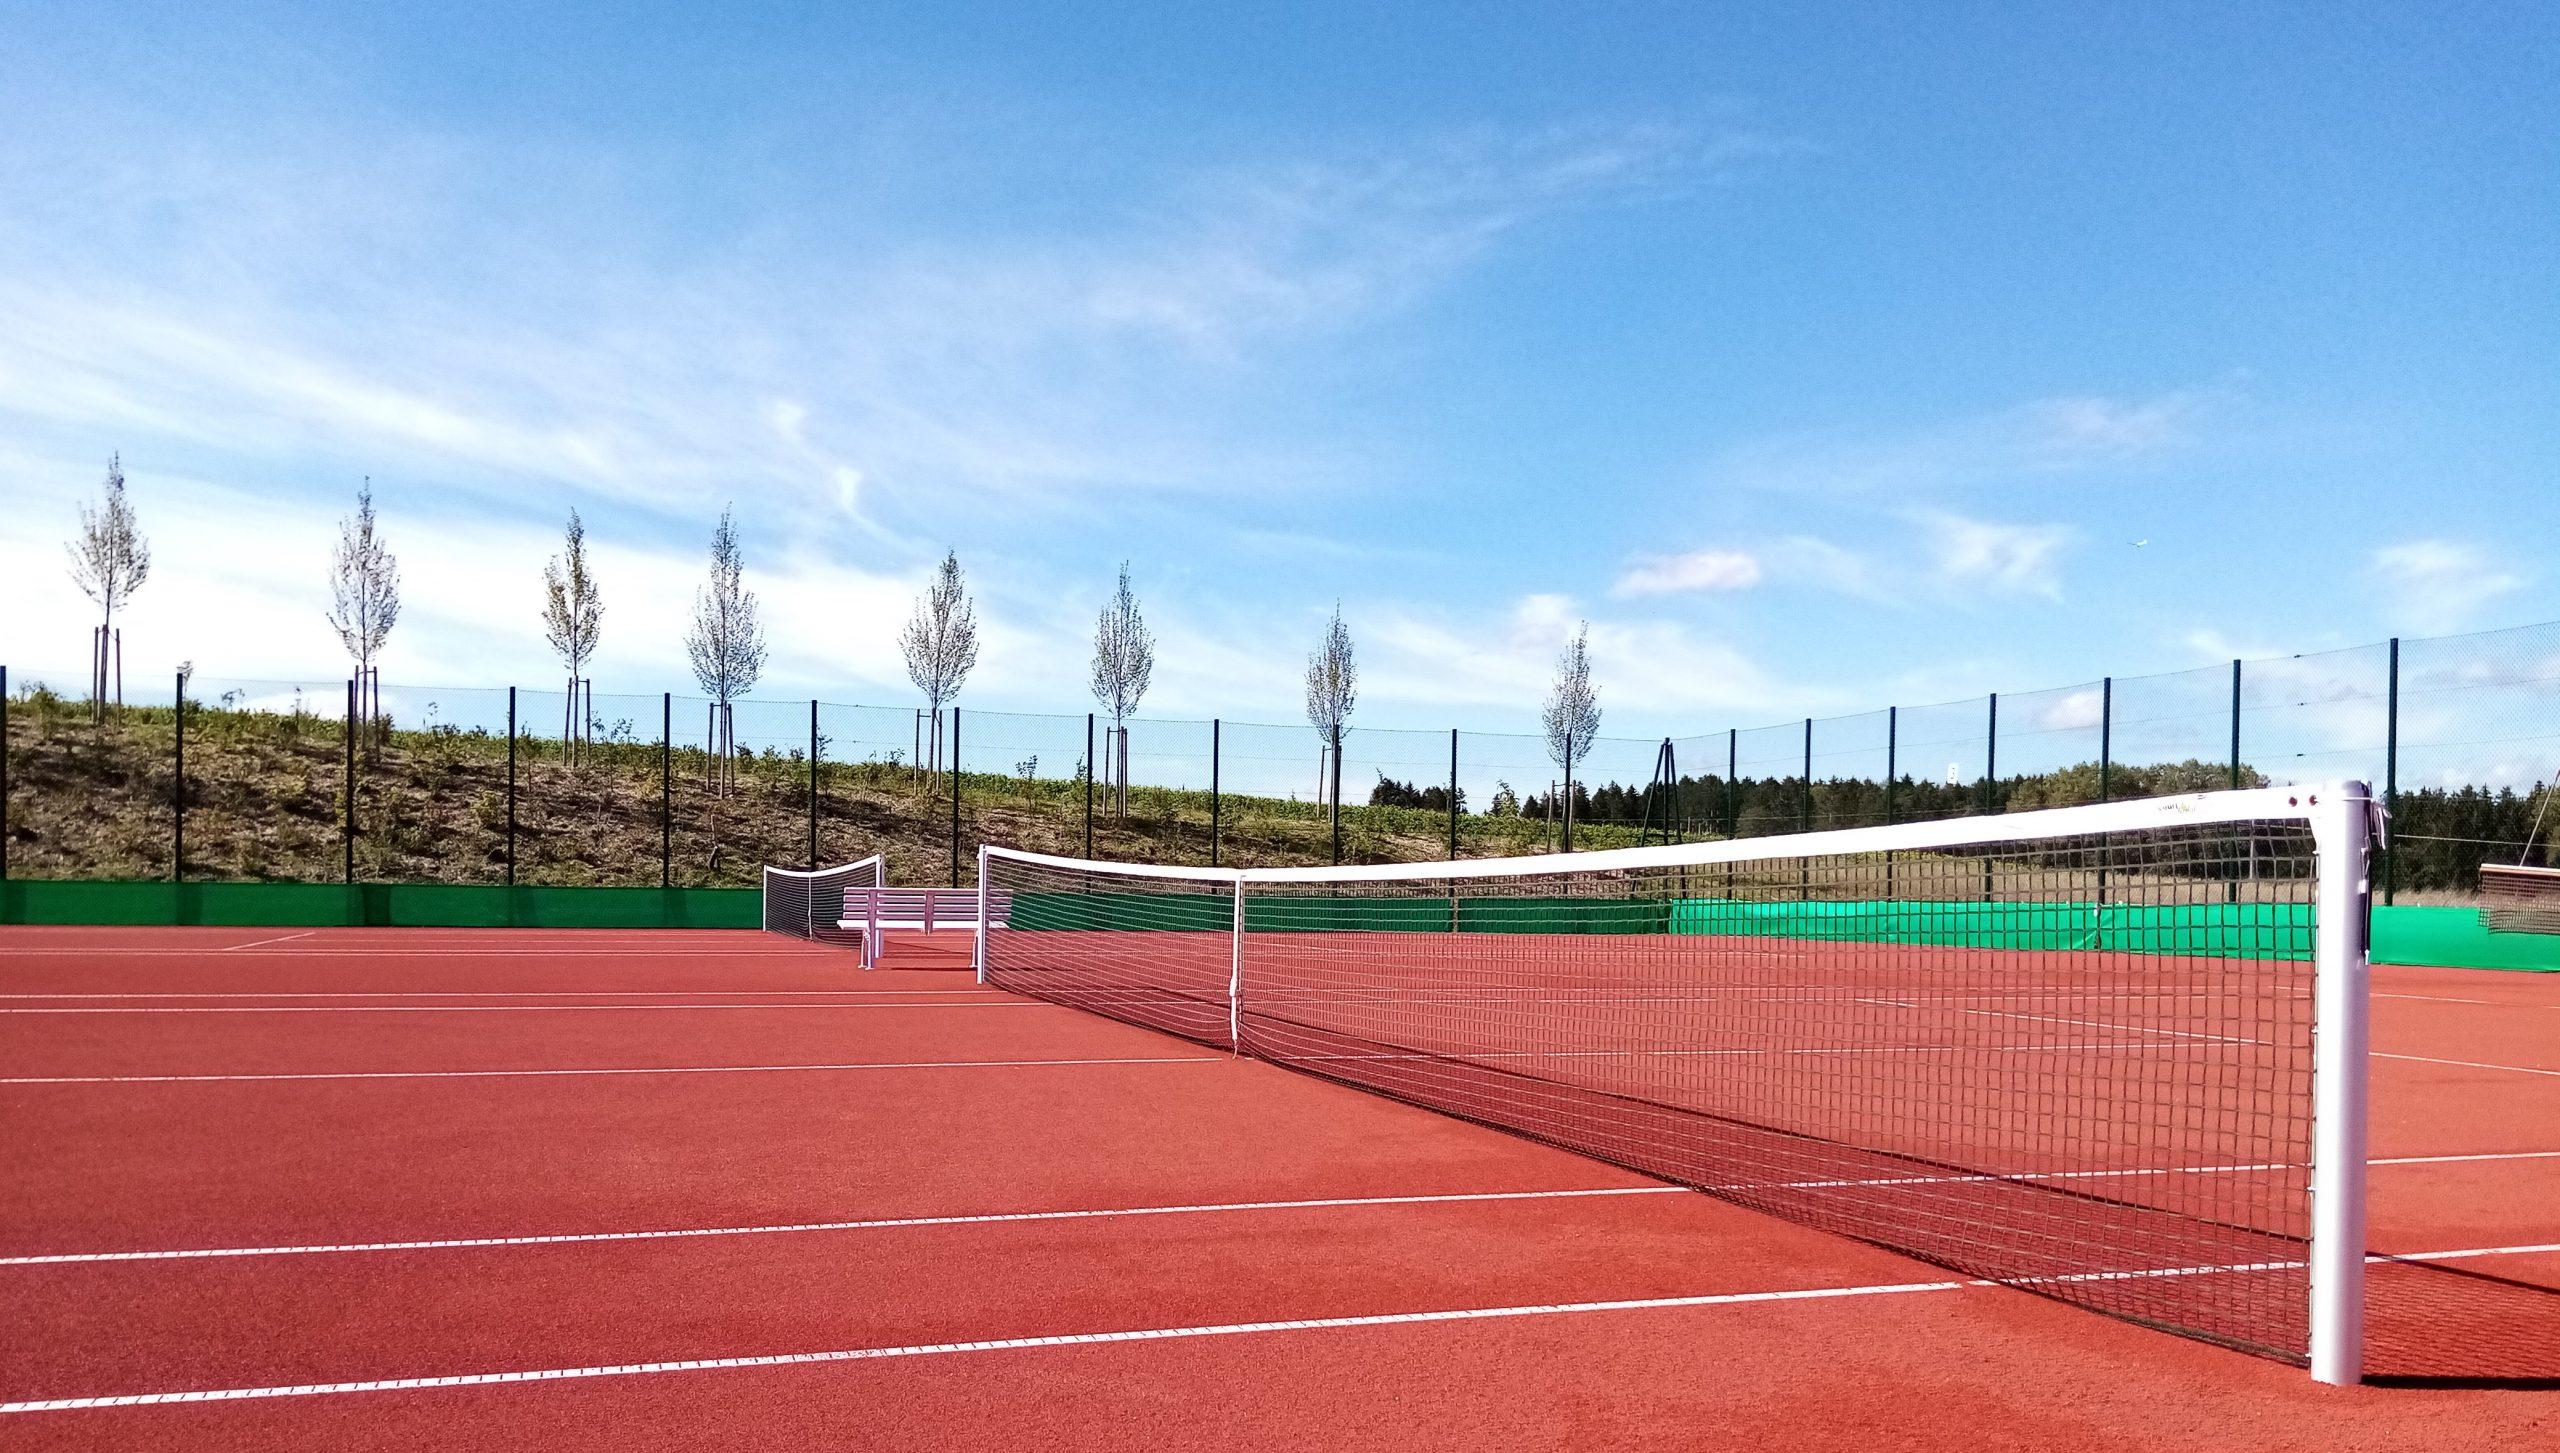 Tennisplätze ab 08.03.2021 geöffnet